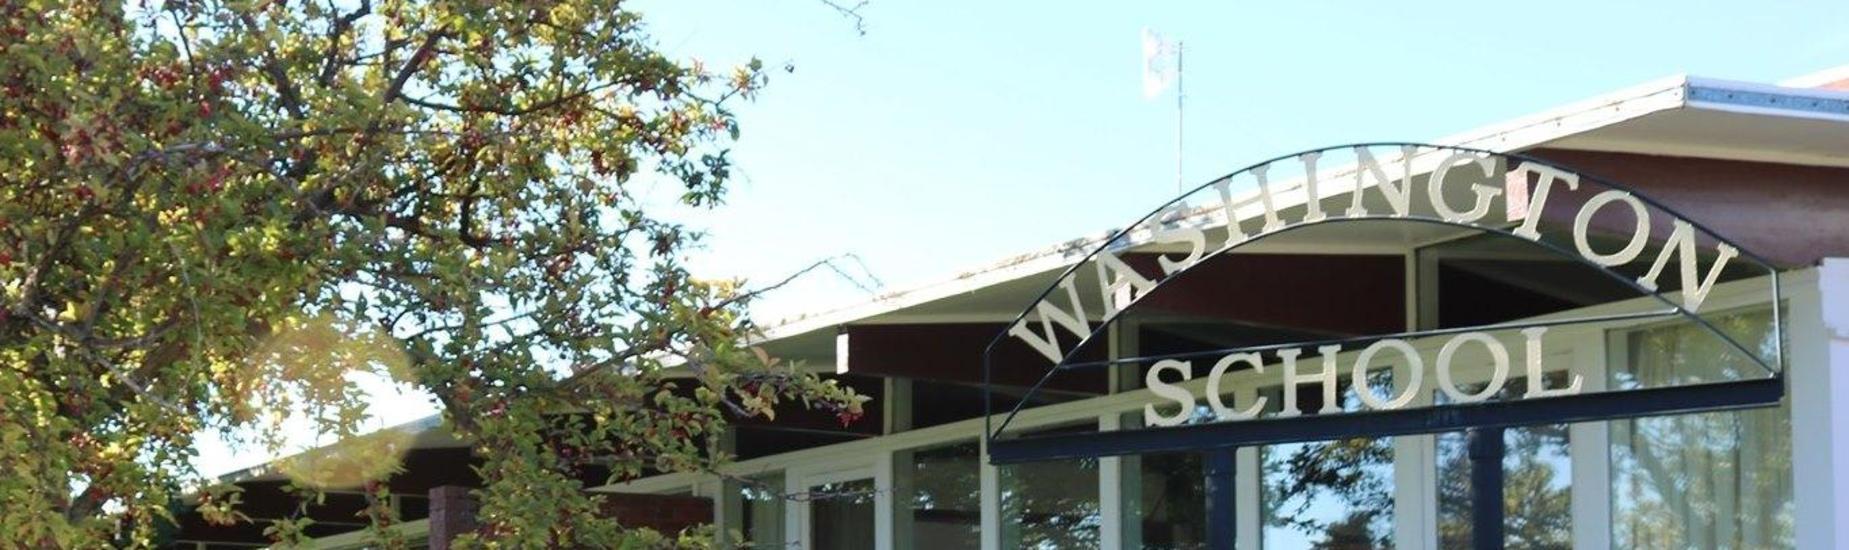 Entrance of Washington School